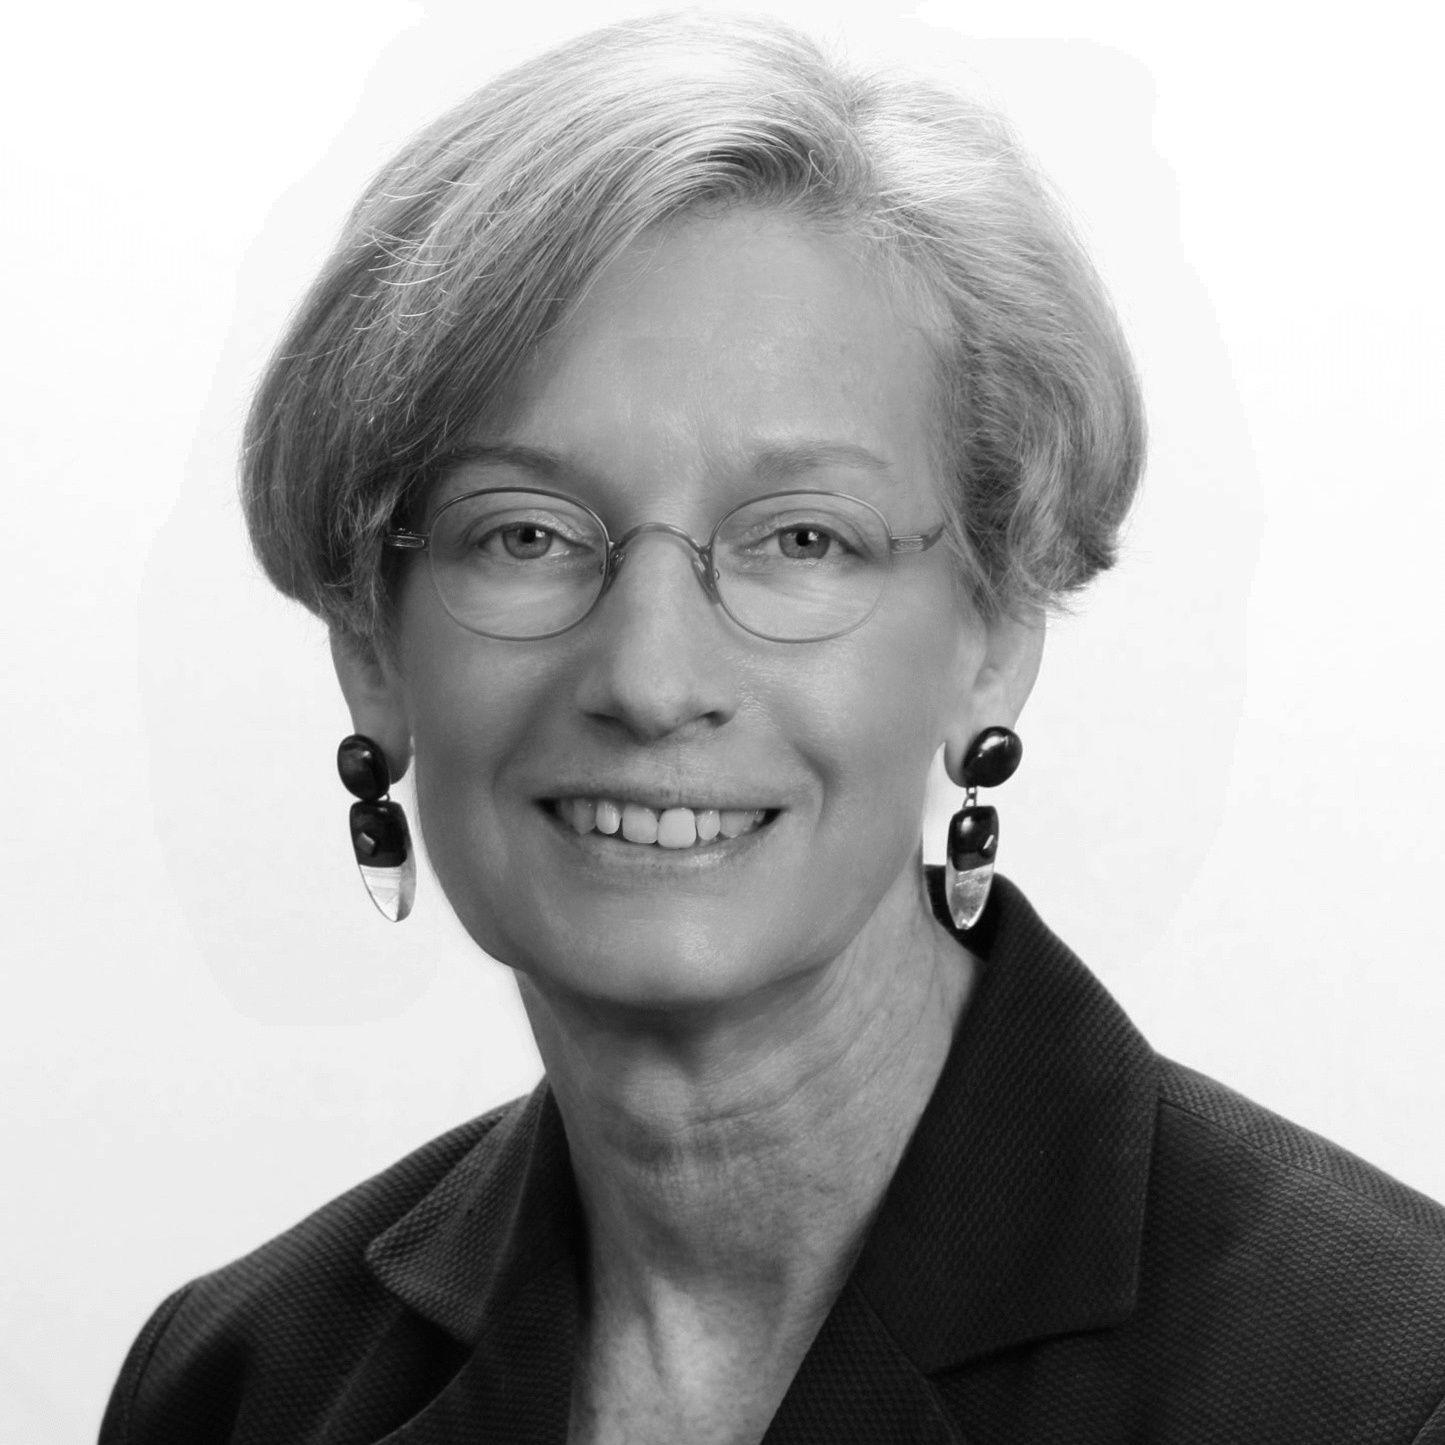 Catherine Mann, Chief Global Economist at Citi